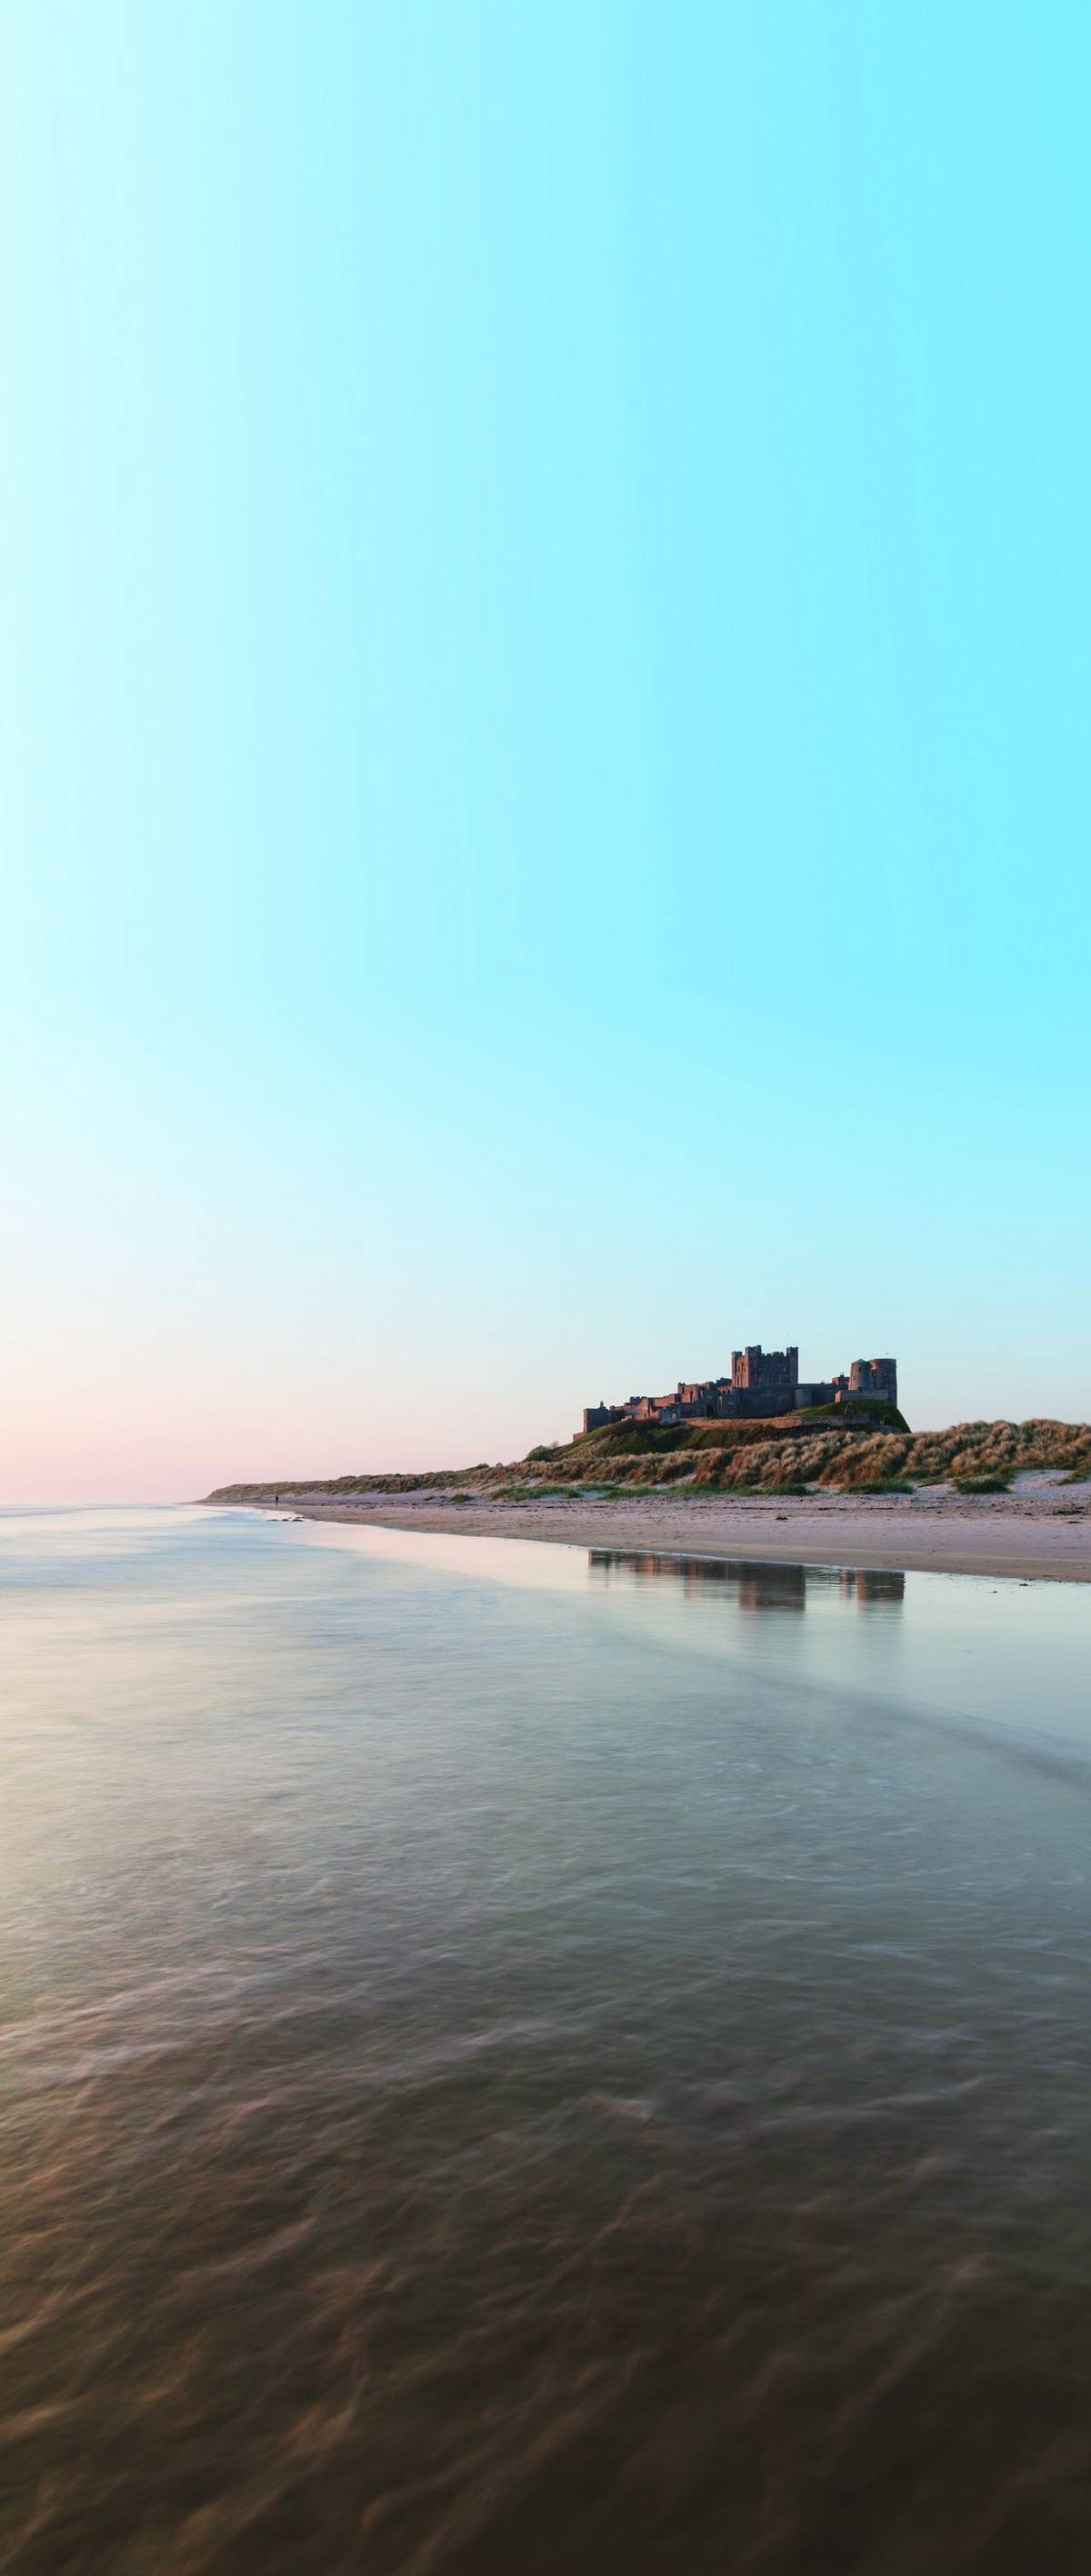 Beautiful landscape image of Bamburgh Castle on Northumberland coast at sunrise with vibrant colors